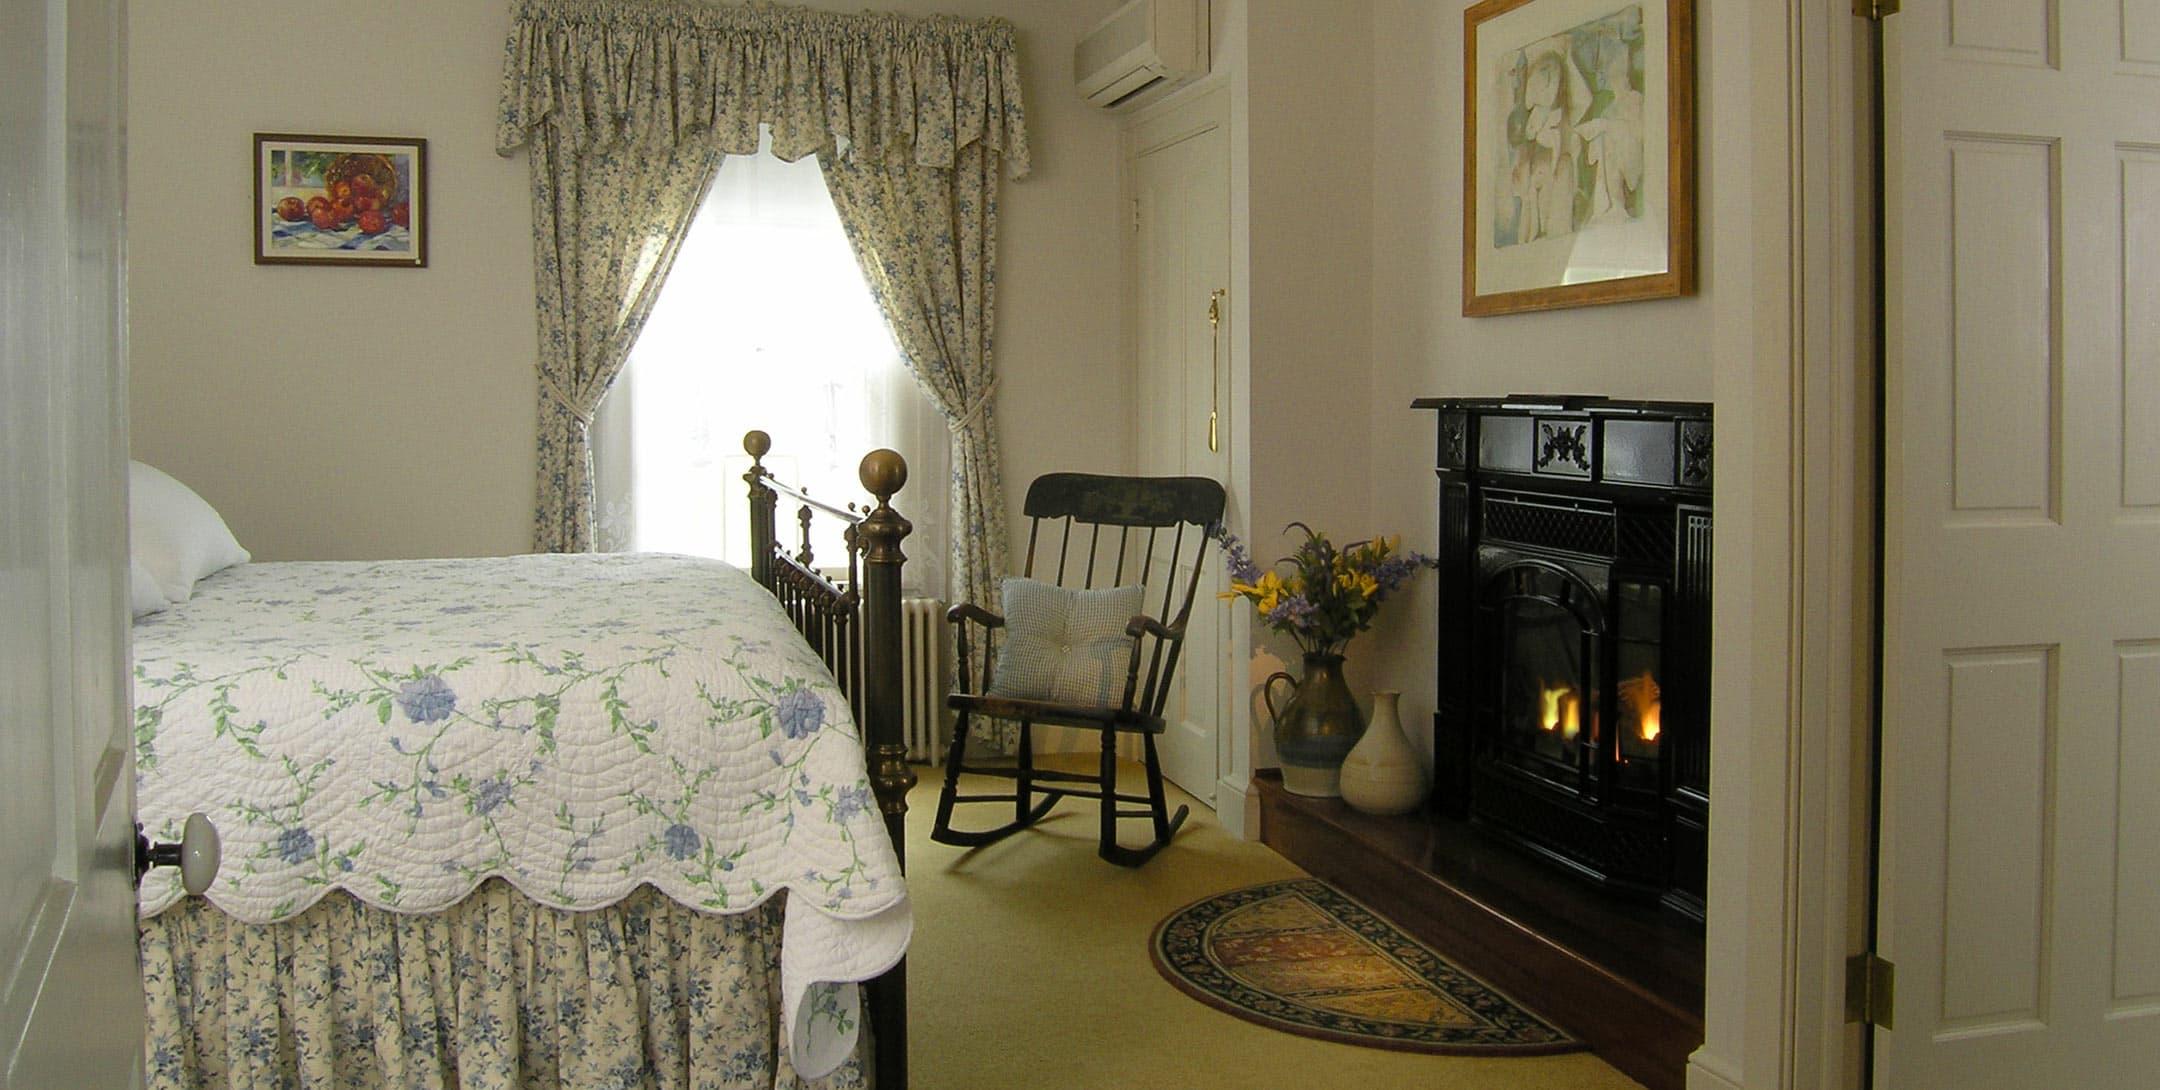 Emory Room - A Romantic Maryland Getaway